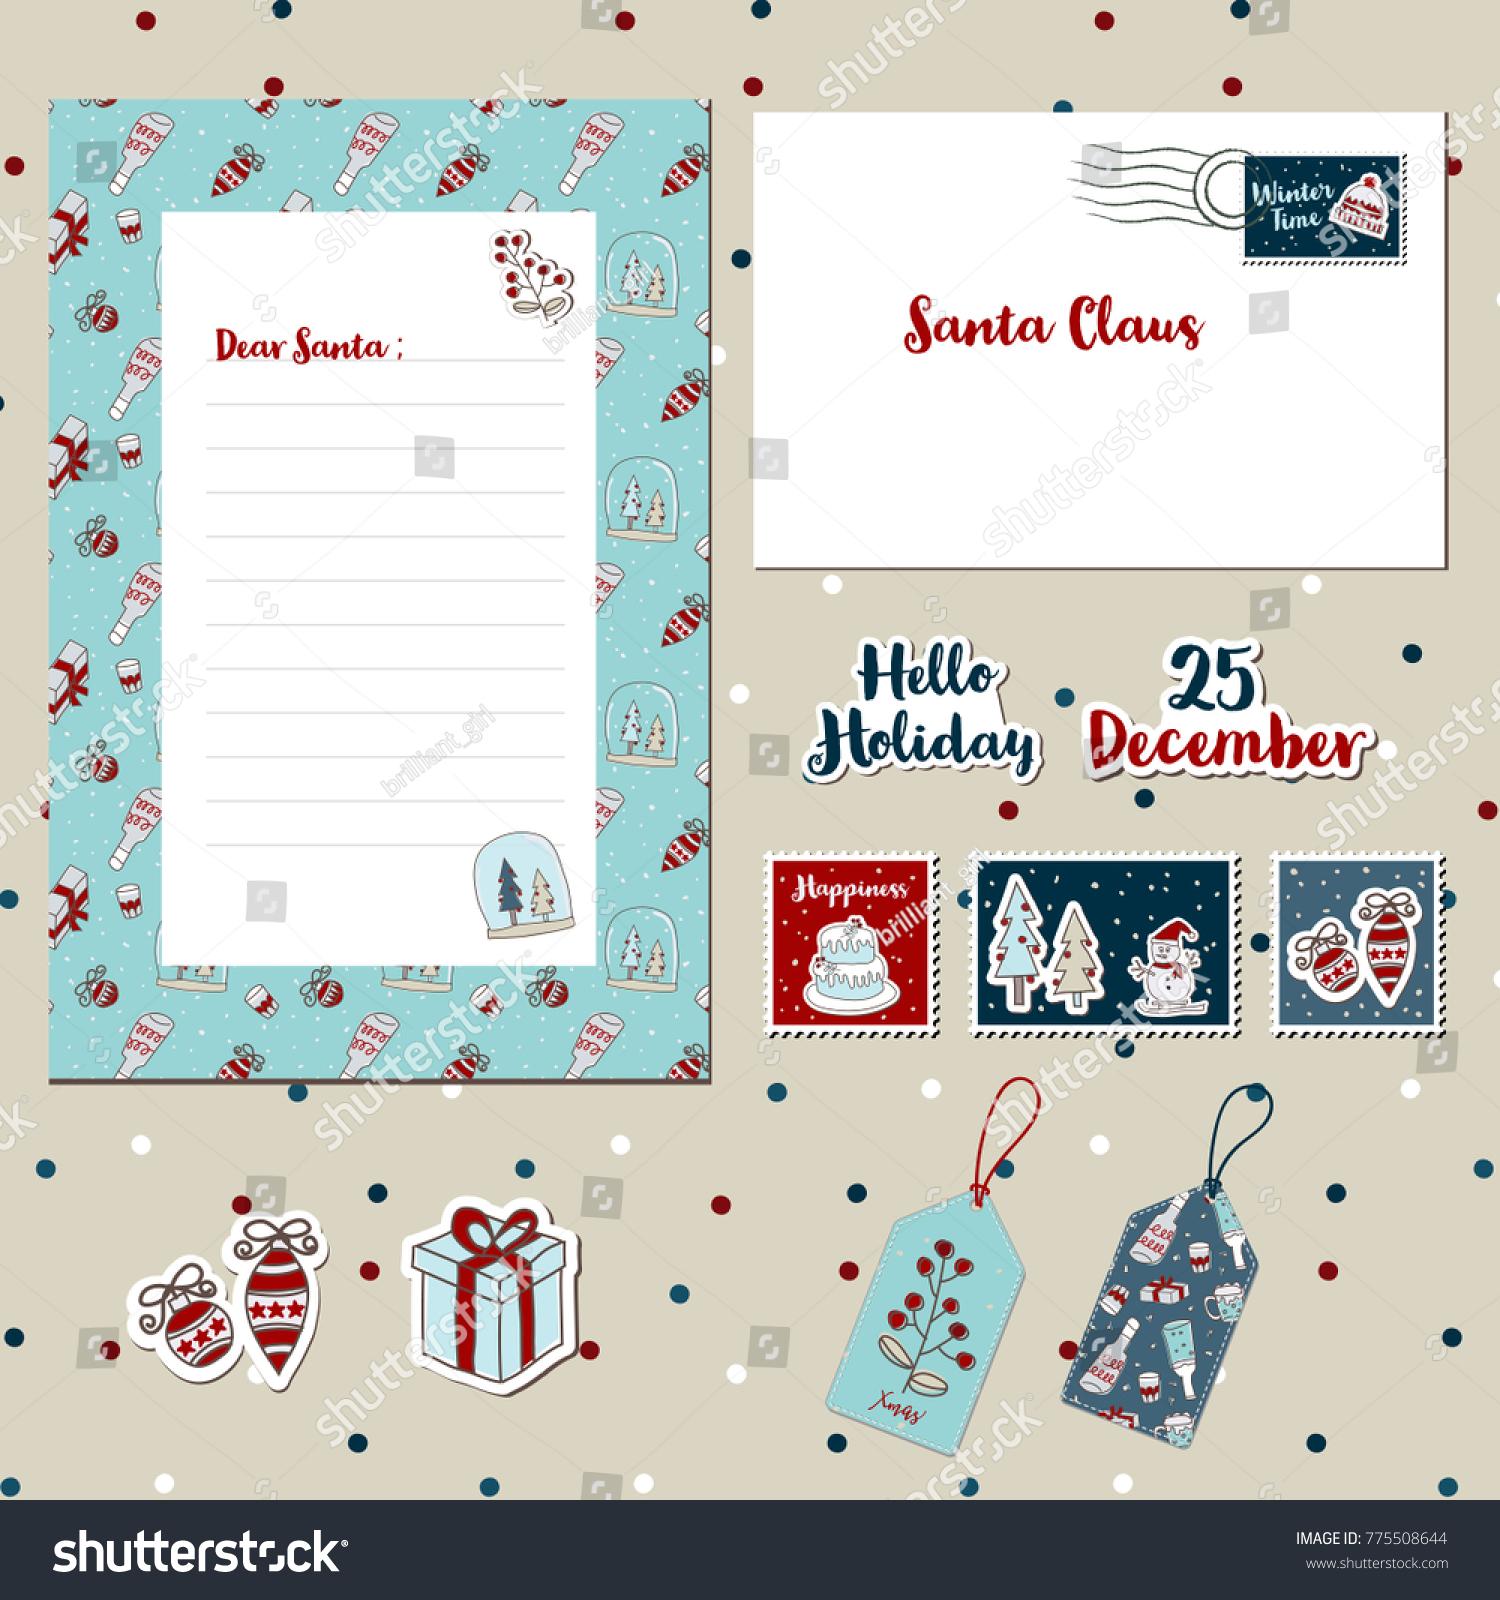 santa letter envelope template - Vaydile.euforic.co